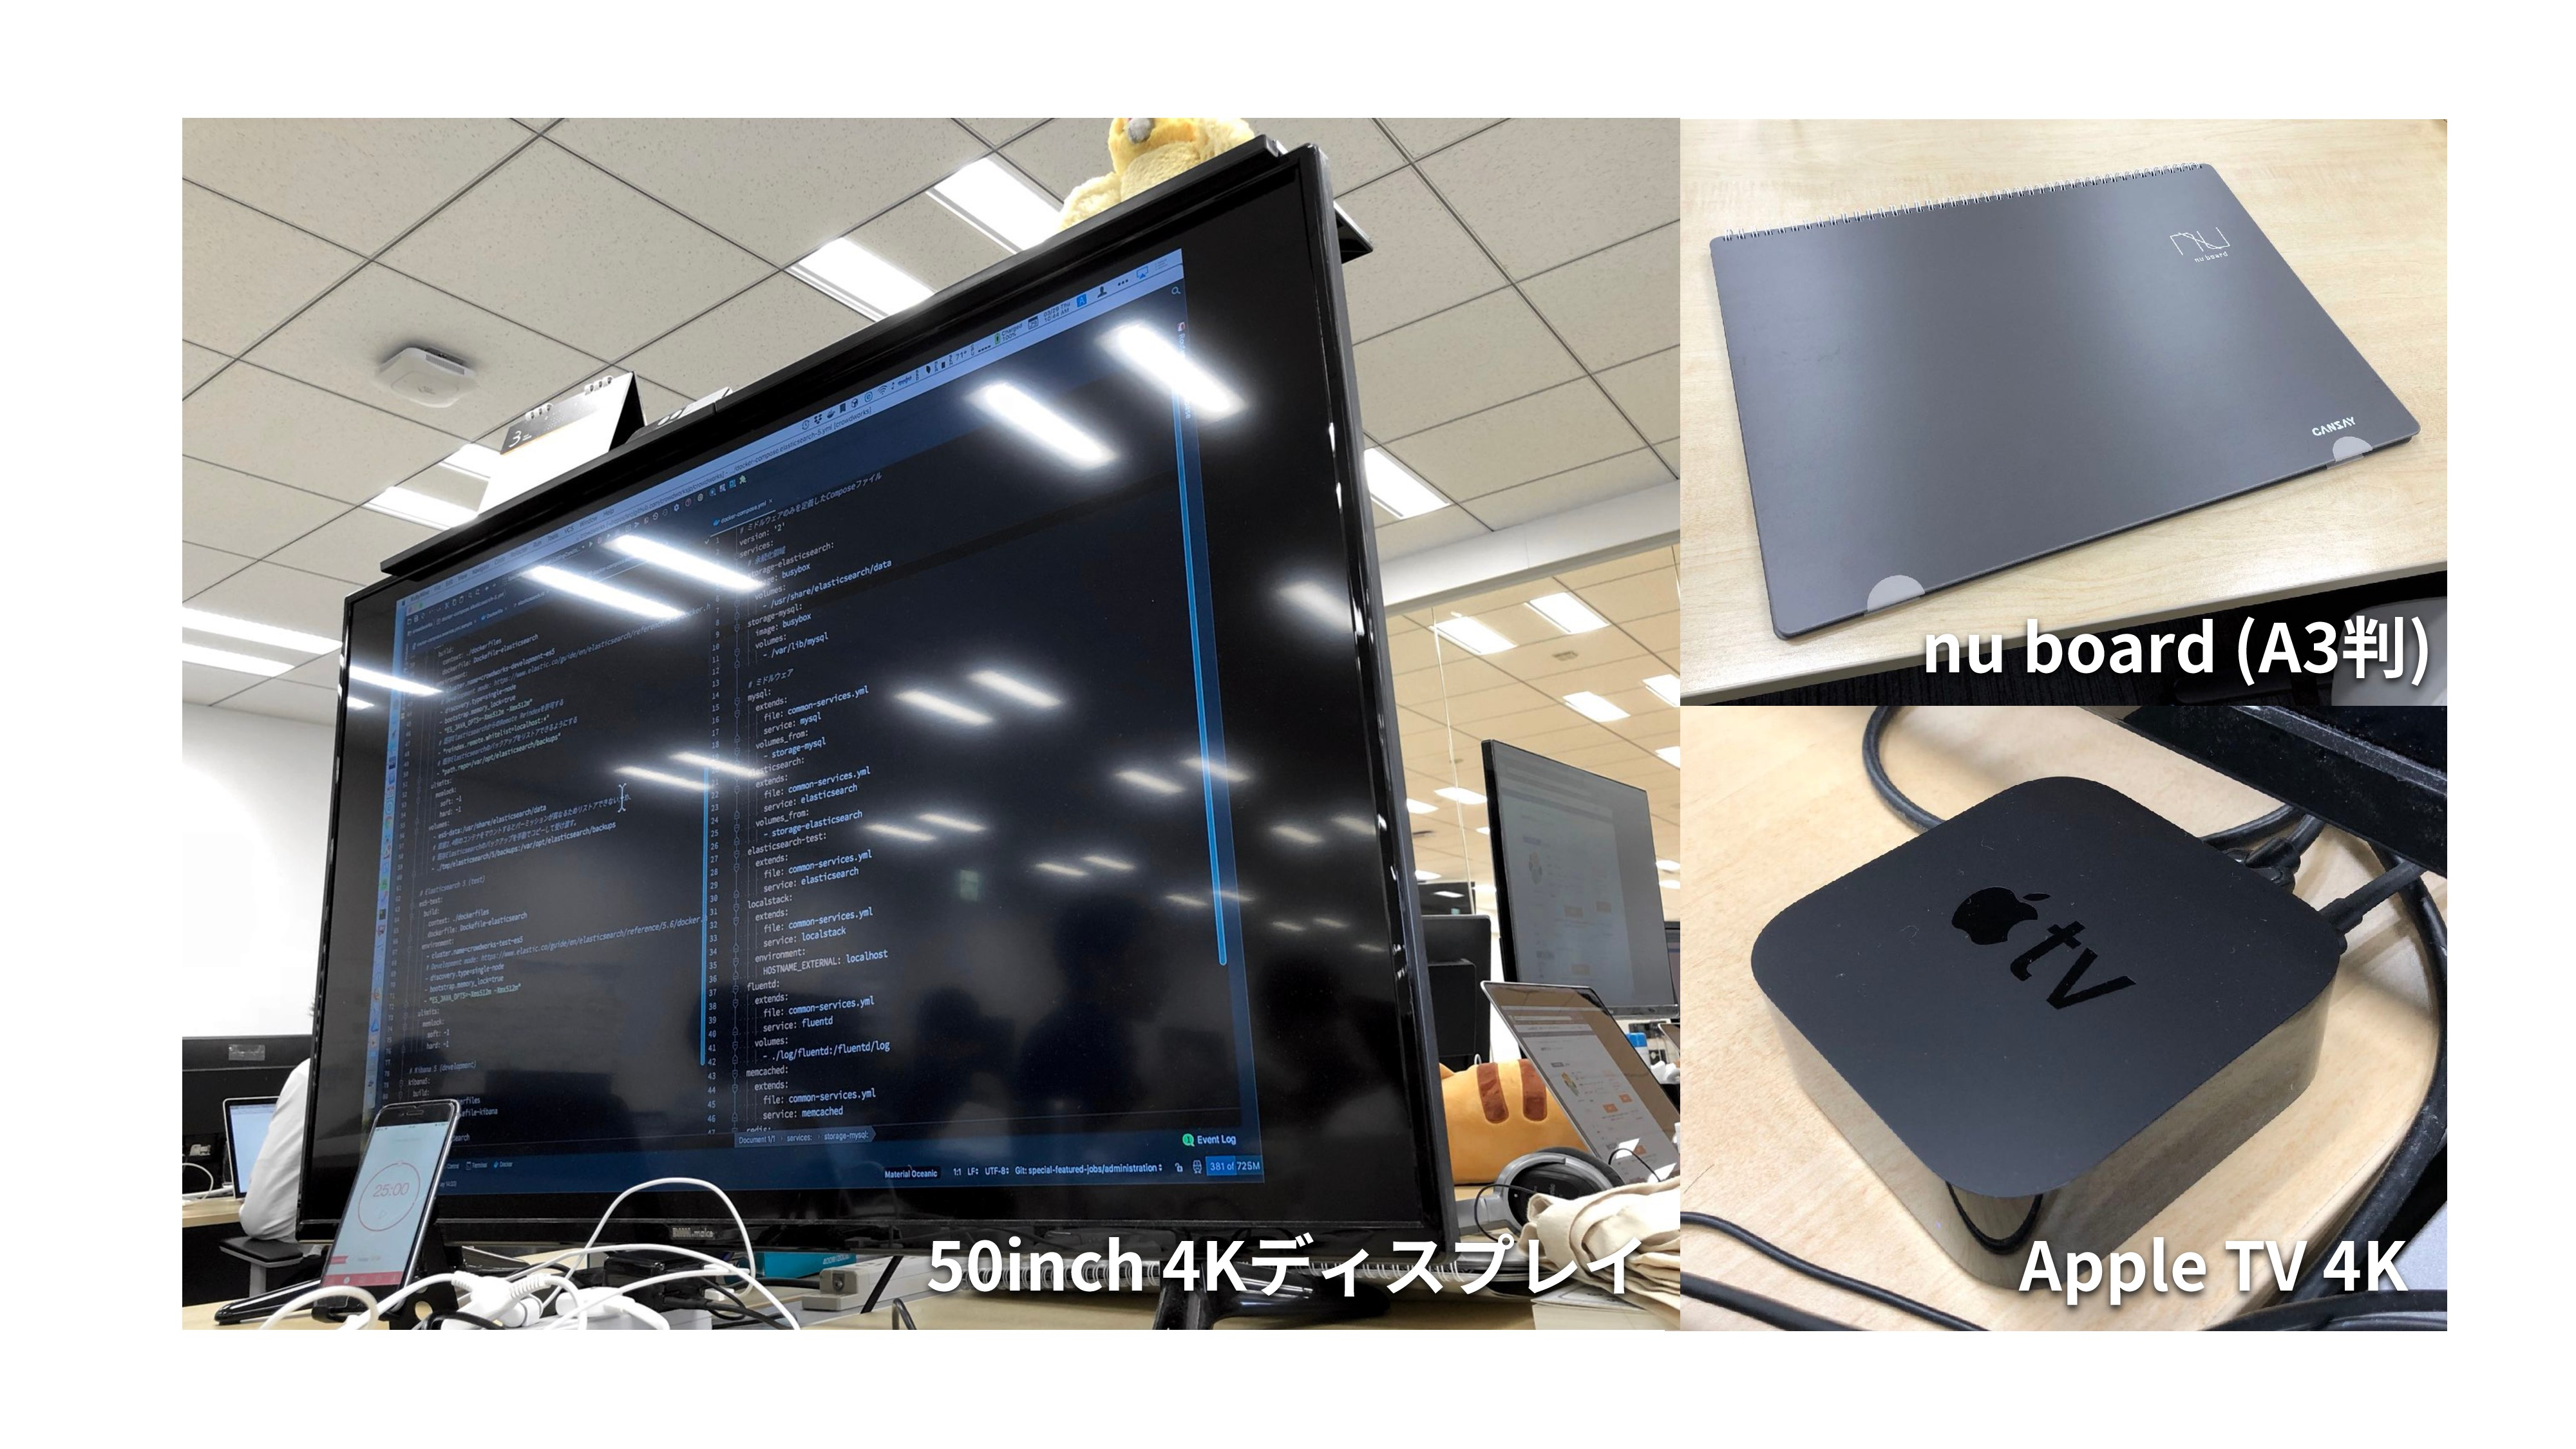 50inch 4Kディスプレイ nu board (A3判) Apple TV 4K